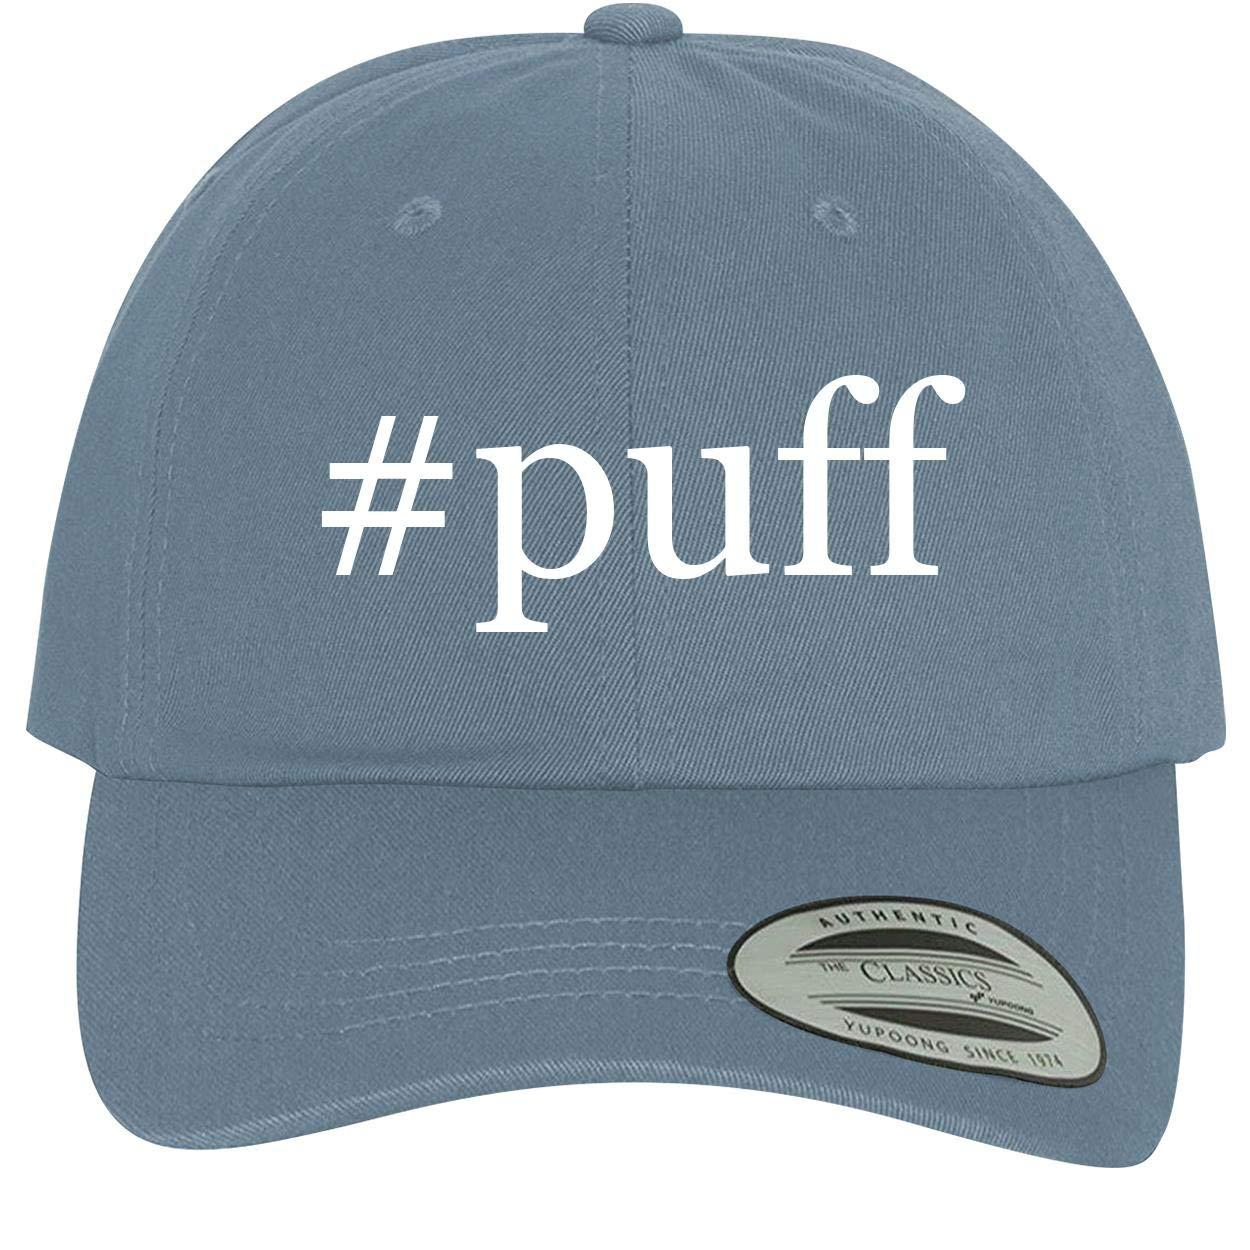 BH Cool Designs #Puff Comfortable Dad Hat Baseball Cap